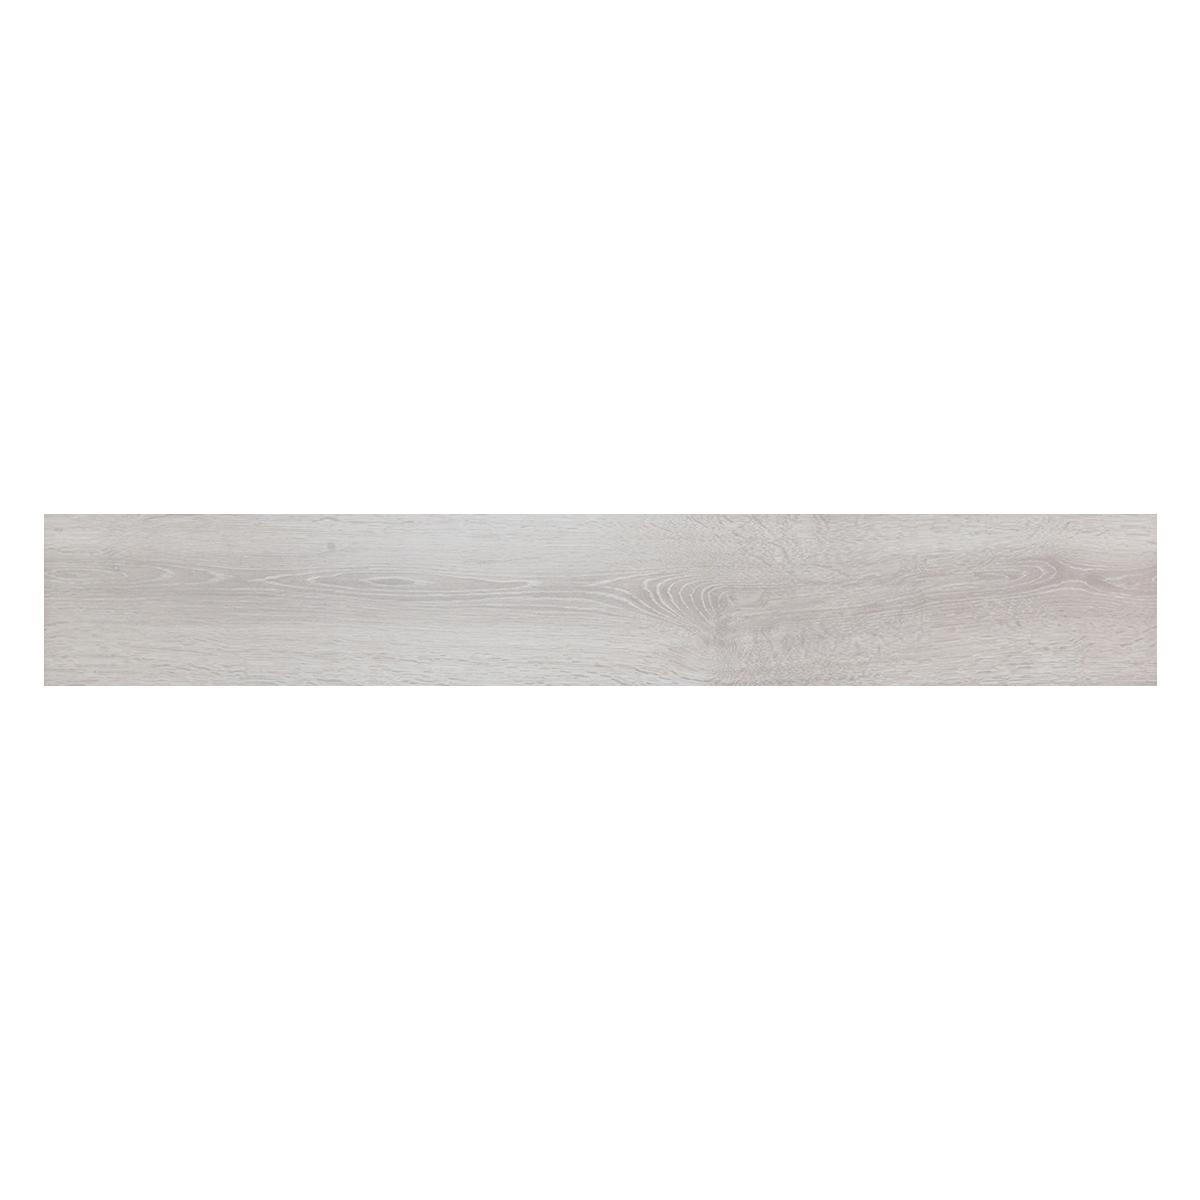 Piso Laminado Argo Navis Roble Oasis Mate - 19.9X121.5 - 2.90 m2